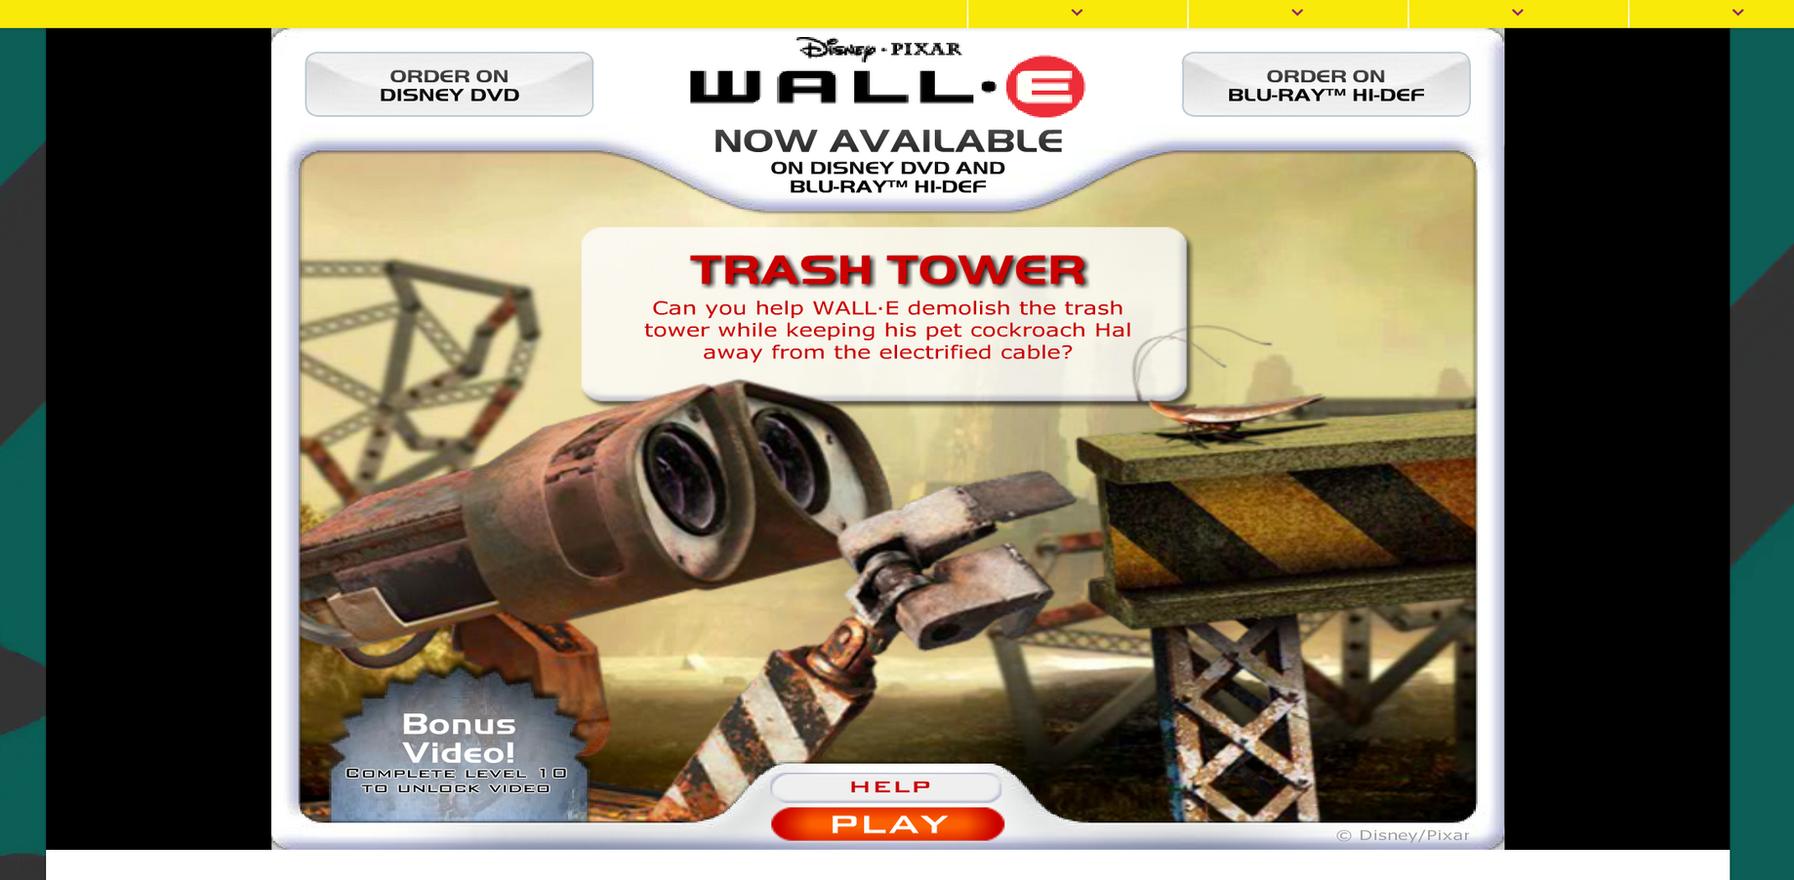 WALL-E Trash Tower Game